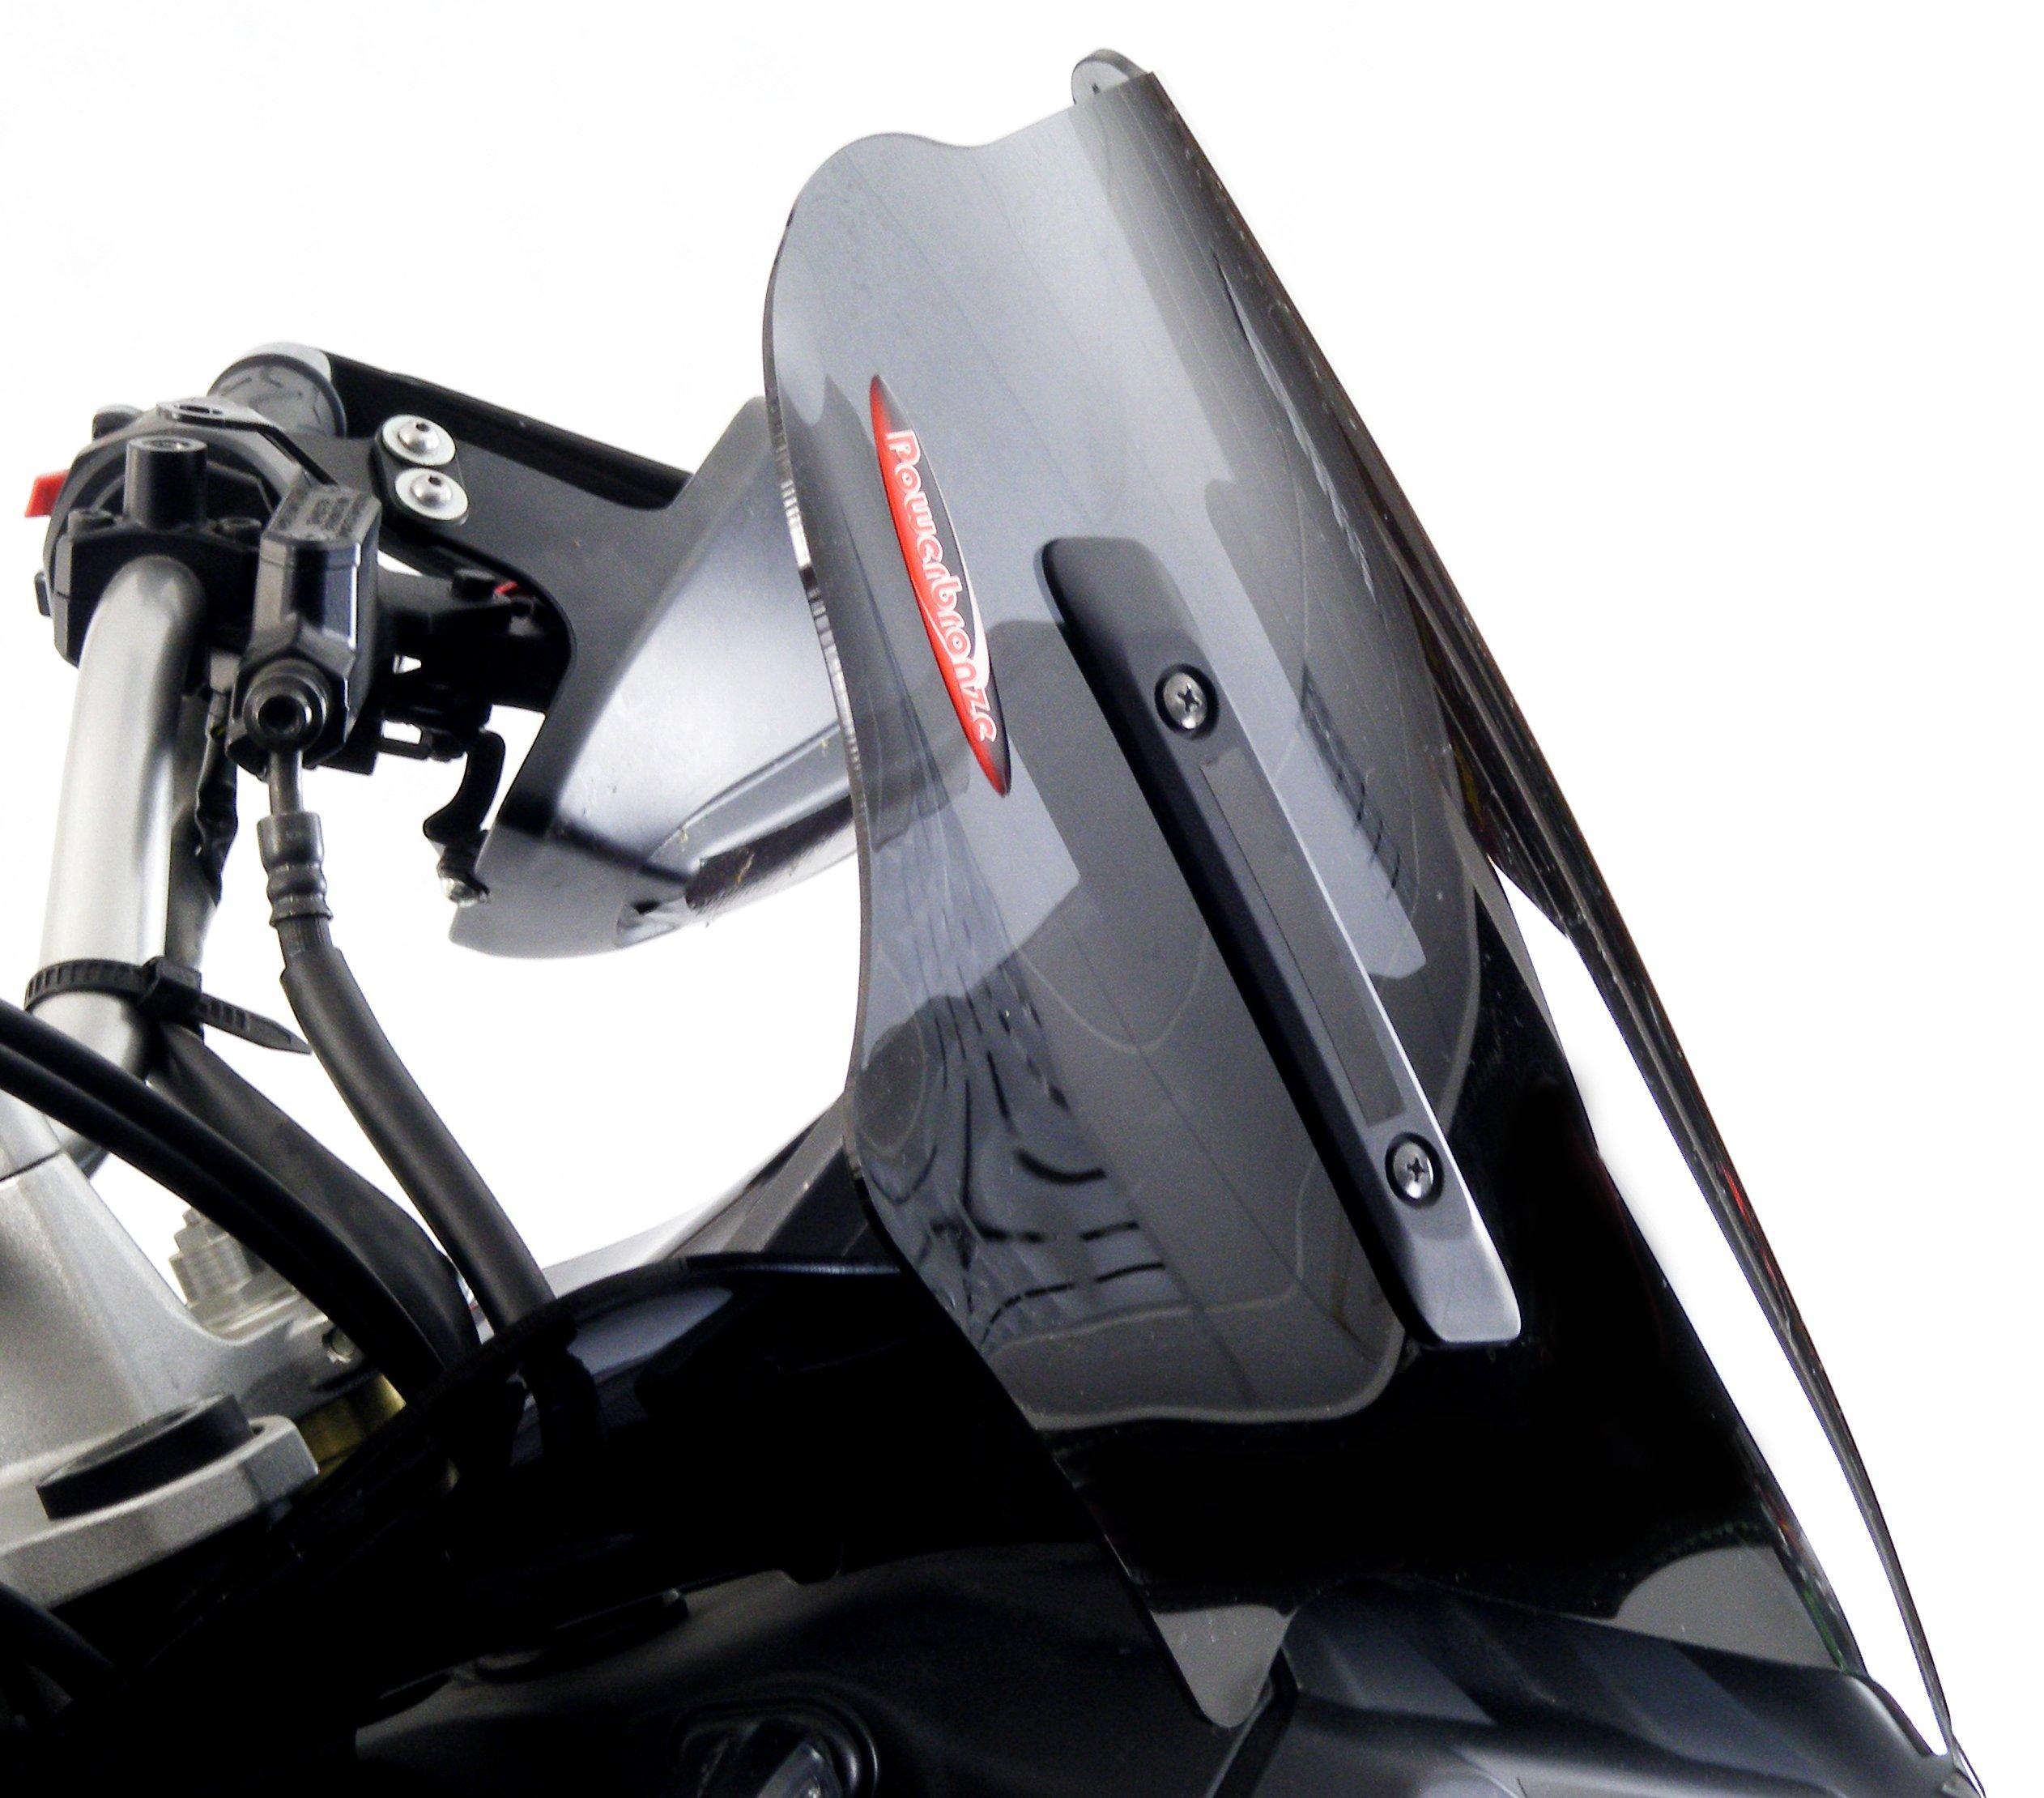 Powerbronze 460-Y102-002 Adventure Sports Screens to fit Yamaha XT1200Z Super Tenere (360mm) Dark Tint